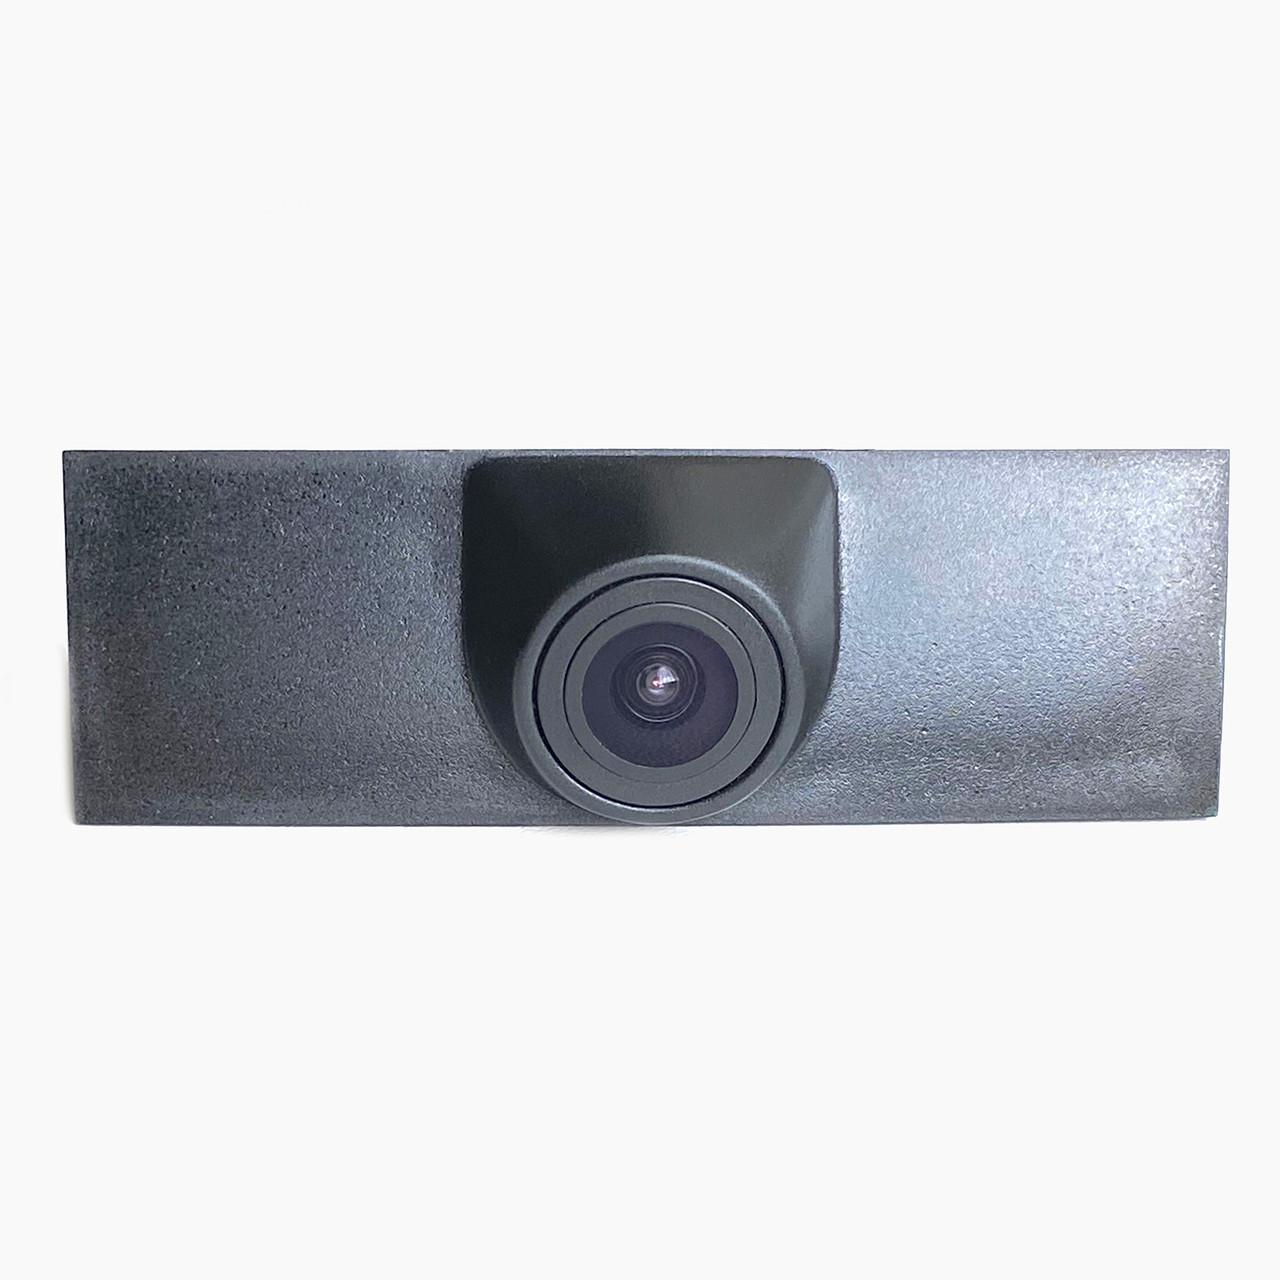 Камера переднего вида Prime-X C8038 (Volkswagen Touareg 13-15)